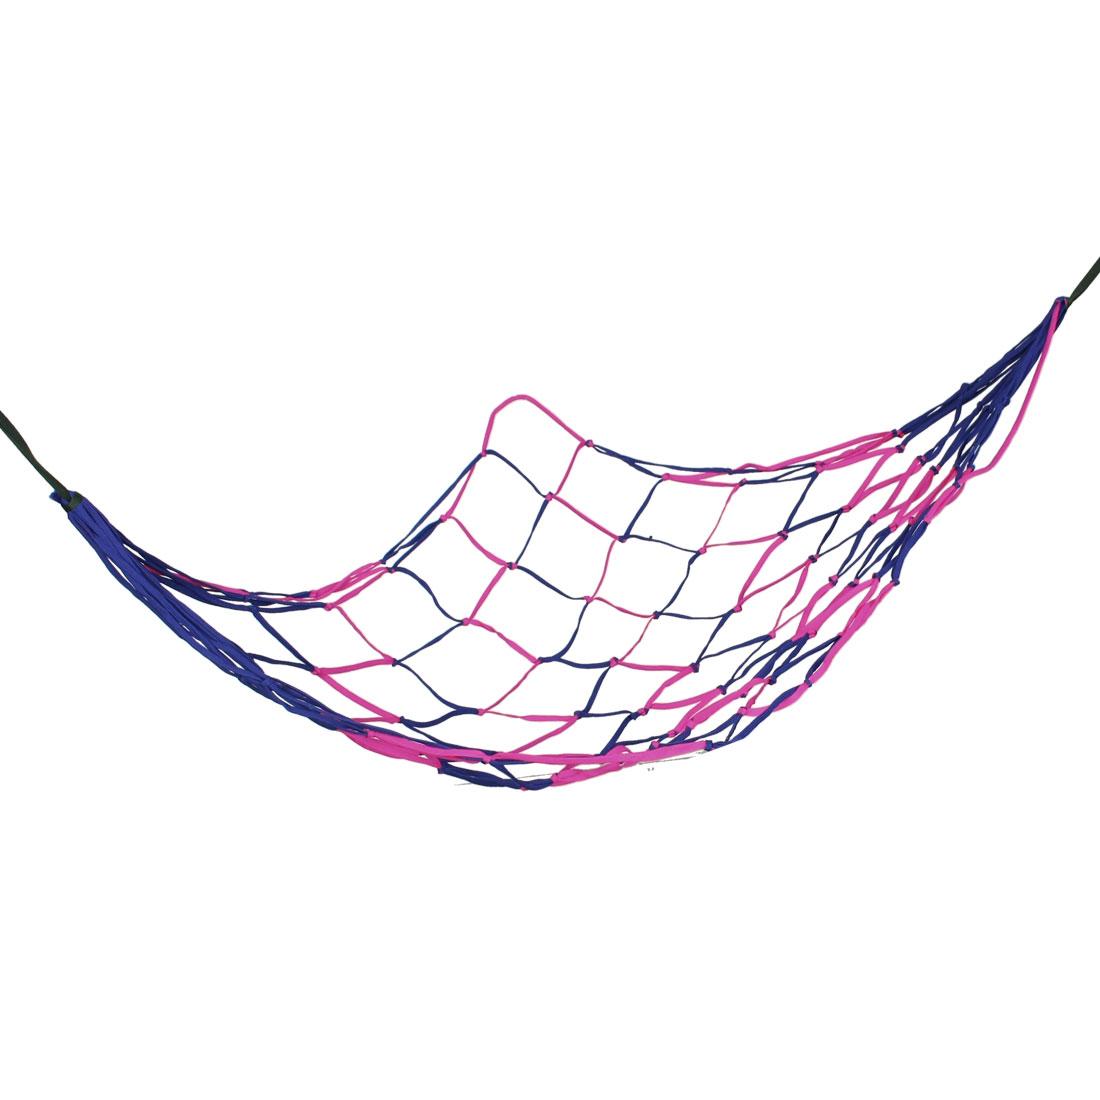 "75"" x 28"" Backyard Nylon Hang Hammock Mesh Net Sleeping Bed Blue Fuchisa"